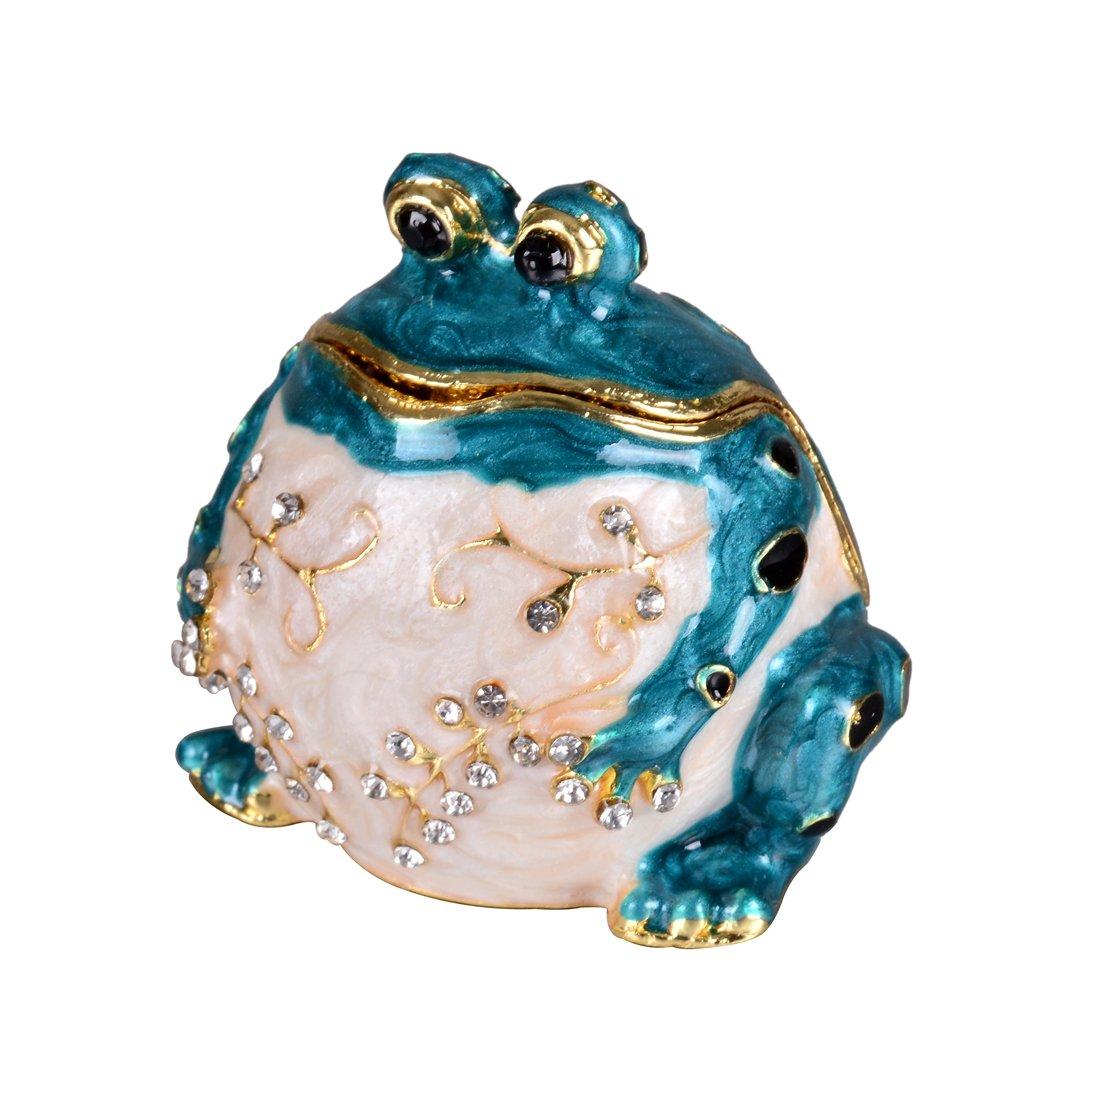 MICG Handmade Blue Frog Trinket Box Wedding Ring Holder Animal Figurine Collectible Table Centerpiece Christmas Gift for Girl